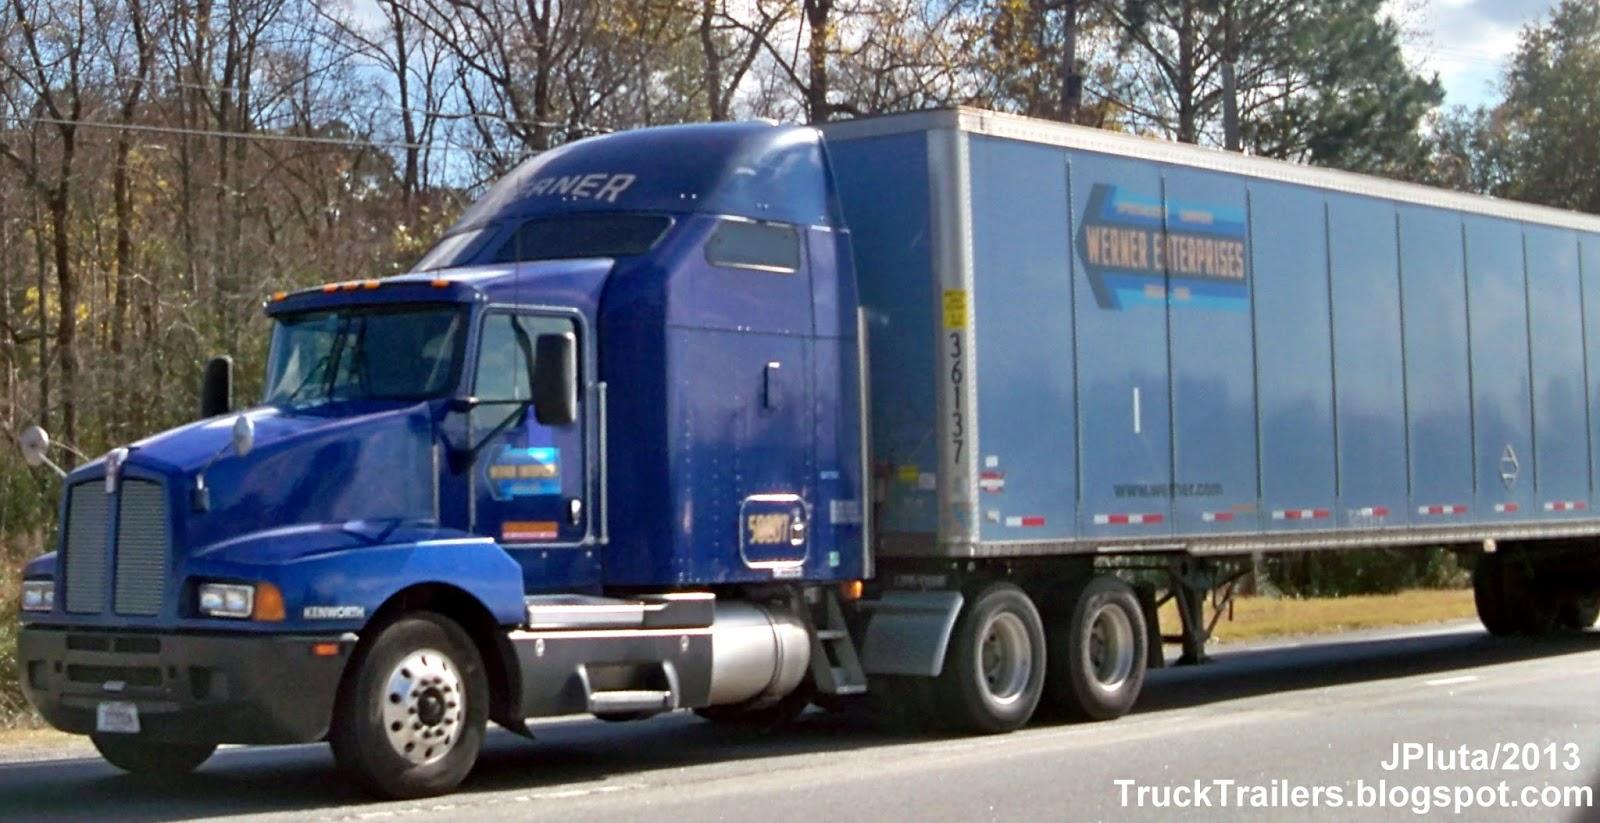 Werner enterprises omaha nebraska kenworth dark blue sleeper cab truck 58207 dry van skirted trailer werner trucking company ne